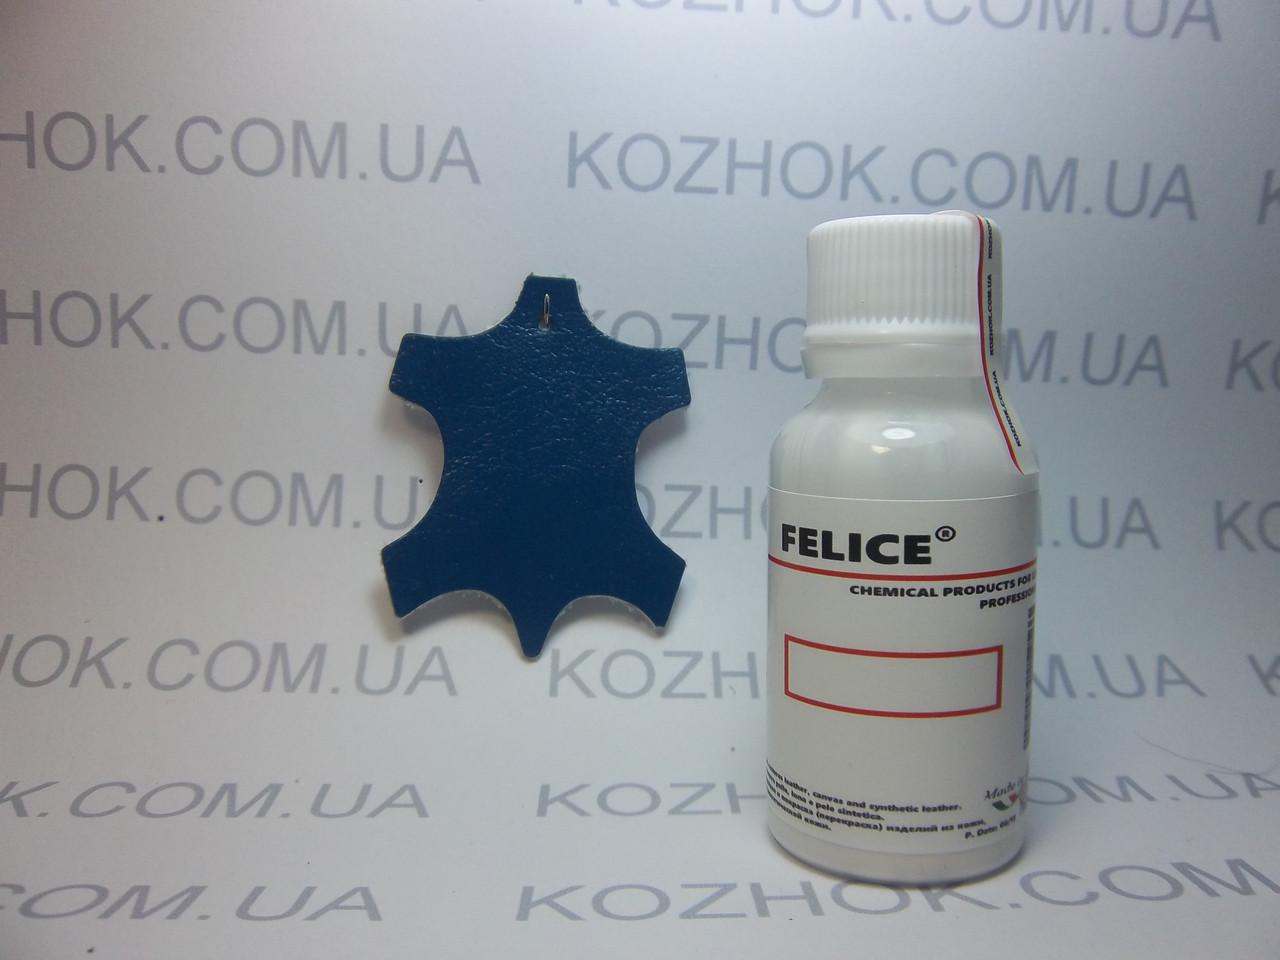 Краска для кожи Felice цв.Синий (25 мл)Для обуви,гладкой кожи, кожгалантереи, кожаной мебели, кожаного салона